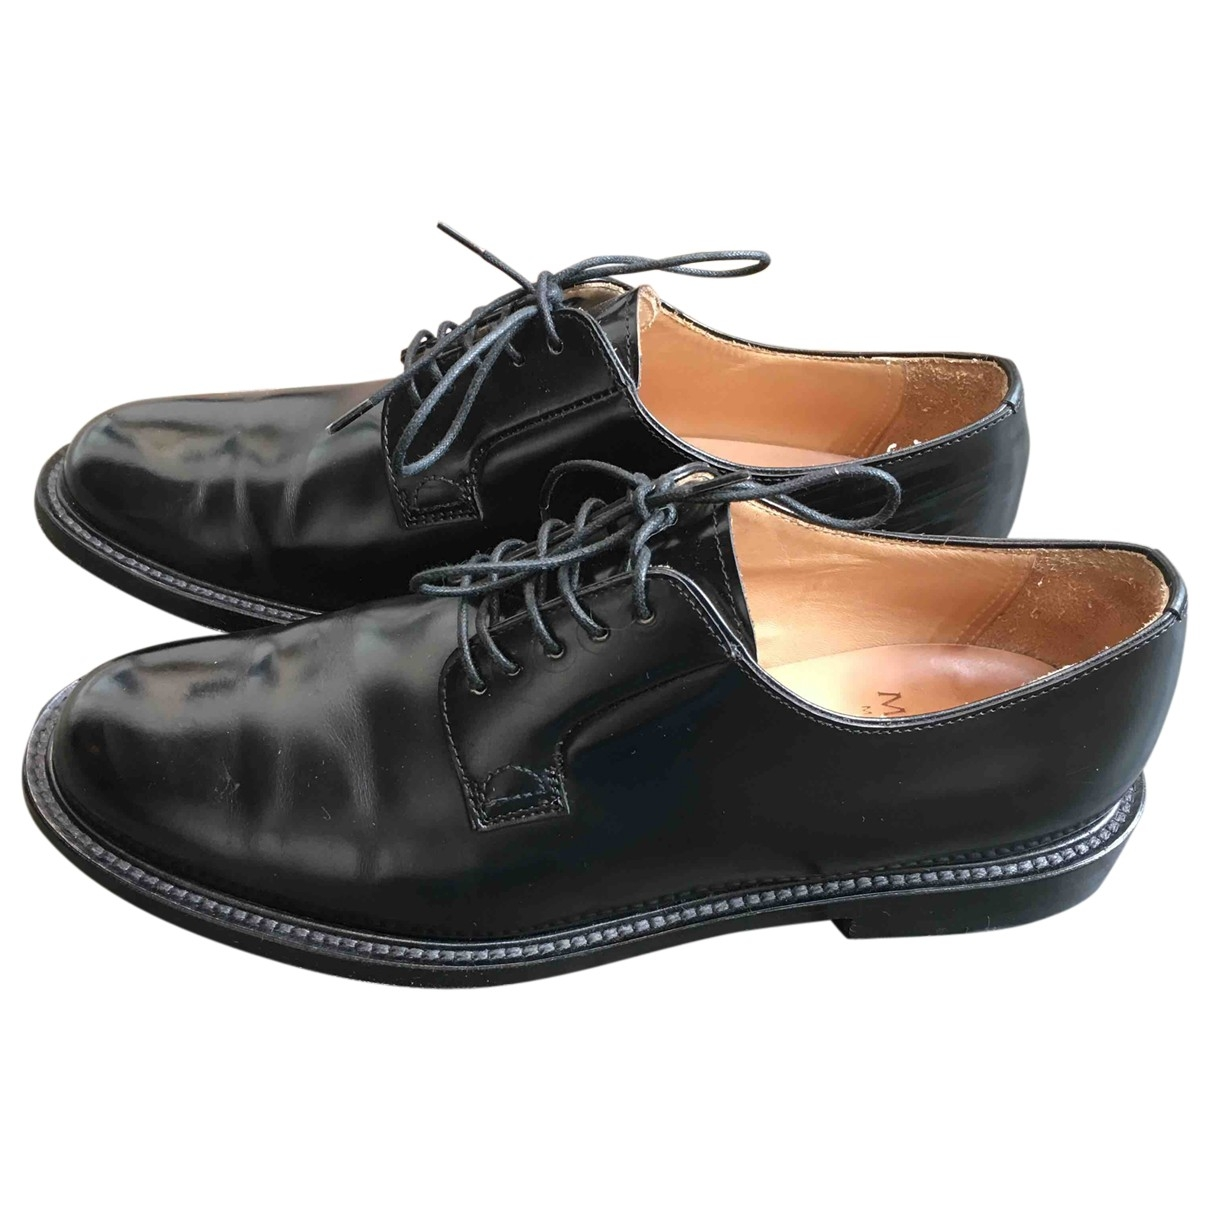 Moncler \N Black Leather Flats for Women 37 EU